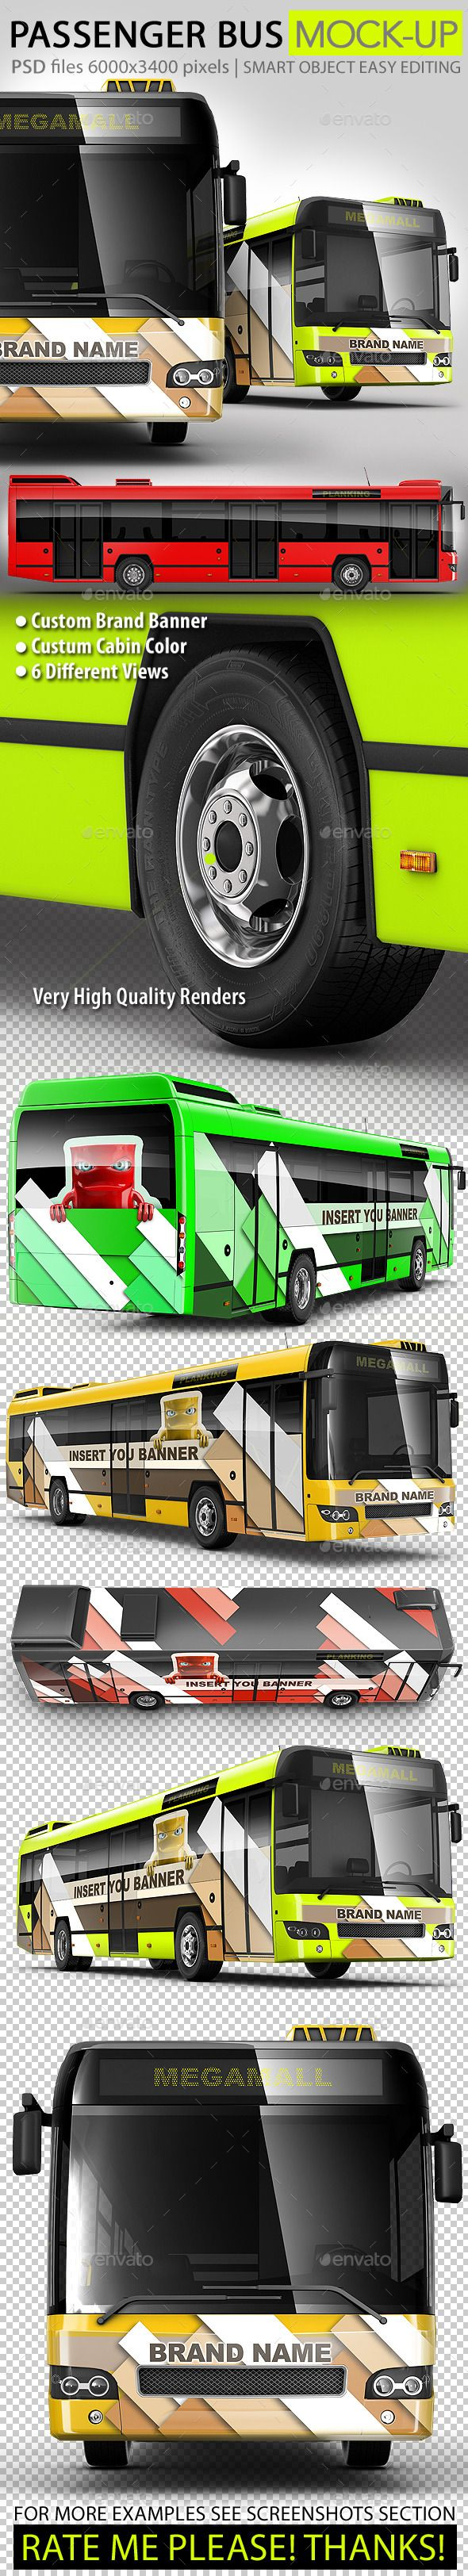 Bus, passenger bus, large Bus mock-up